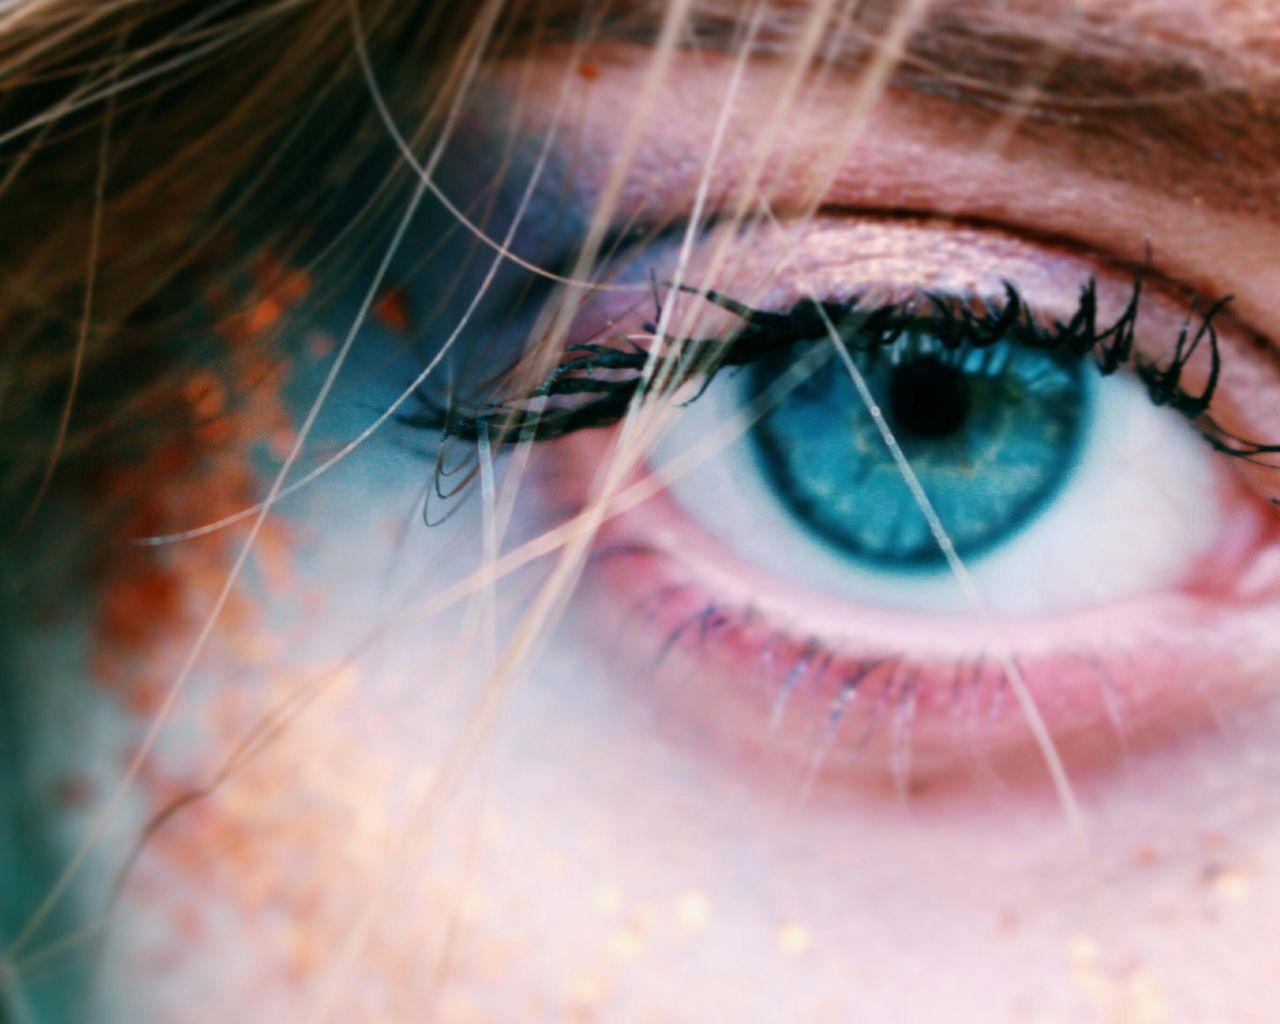 Human Eye Eyesight Human Body Part Eyelash One Person Iris - Eye Eyeball Adult People Eyebrow Close-up One Woman Only Only Women Women Sensory Perception Beautiful Woman Beauty Outdoors Adults Only Day Art The Portraitist - 2017 EyeEm Awards EyeEmNewHere Portrait